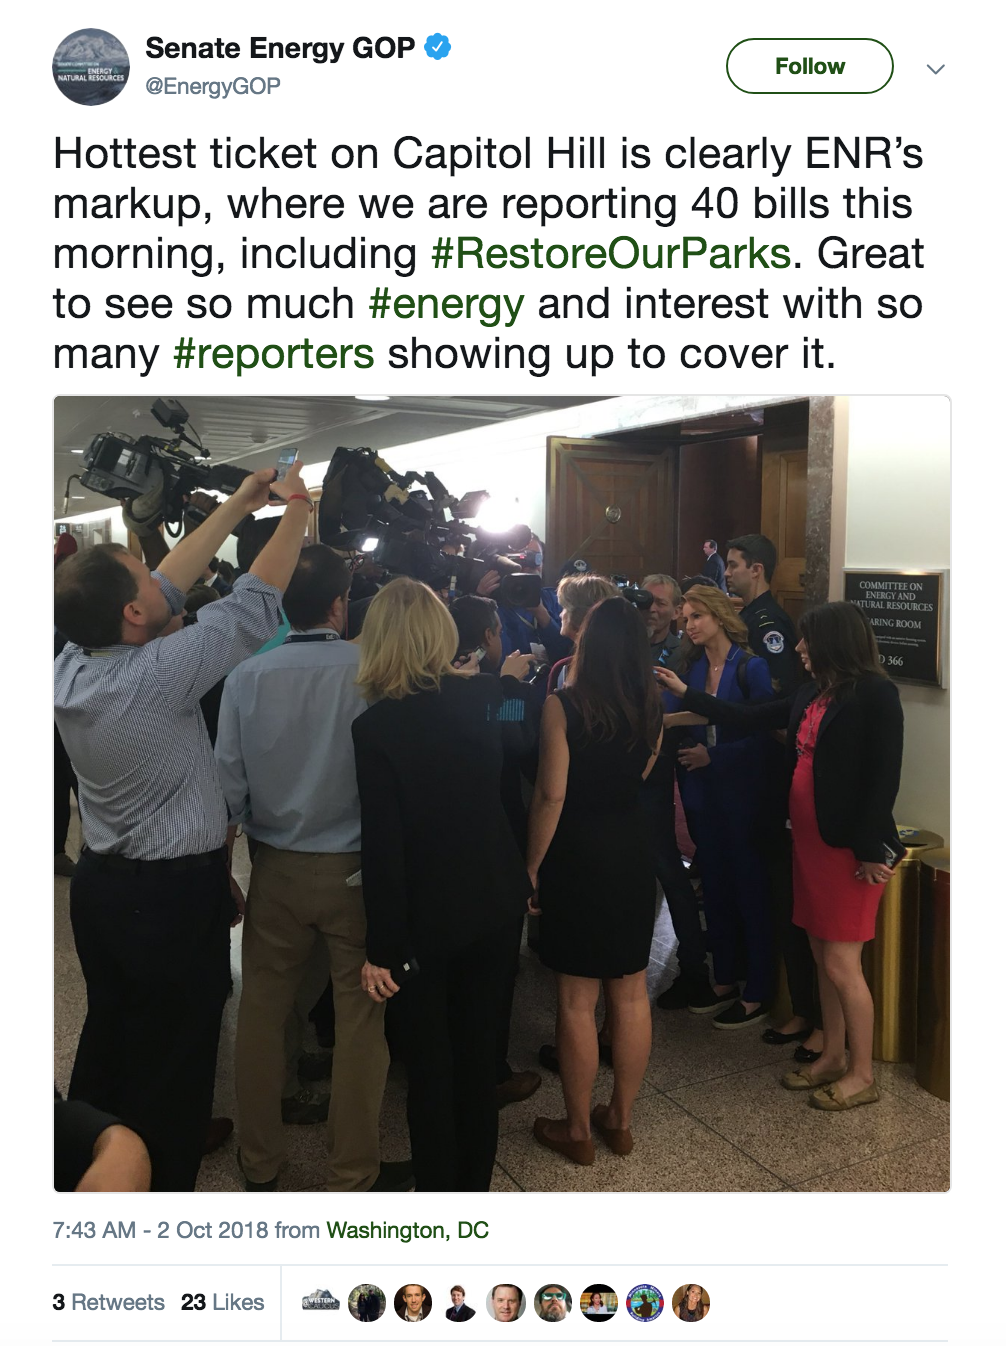 Screenshot of Senate GOP Energy tweet about Sen. Murkowski